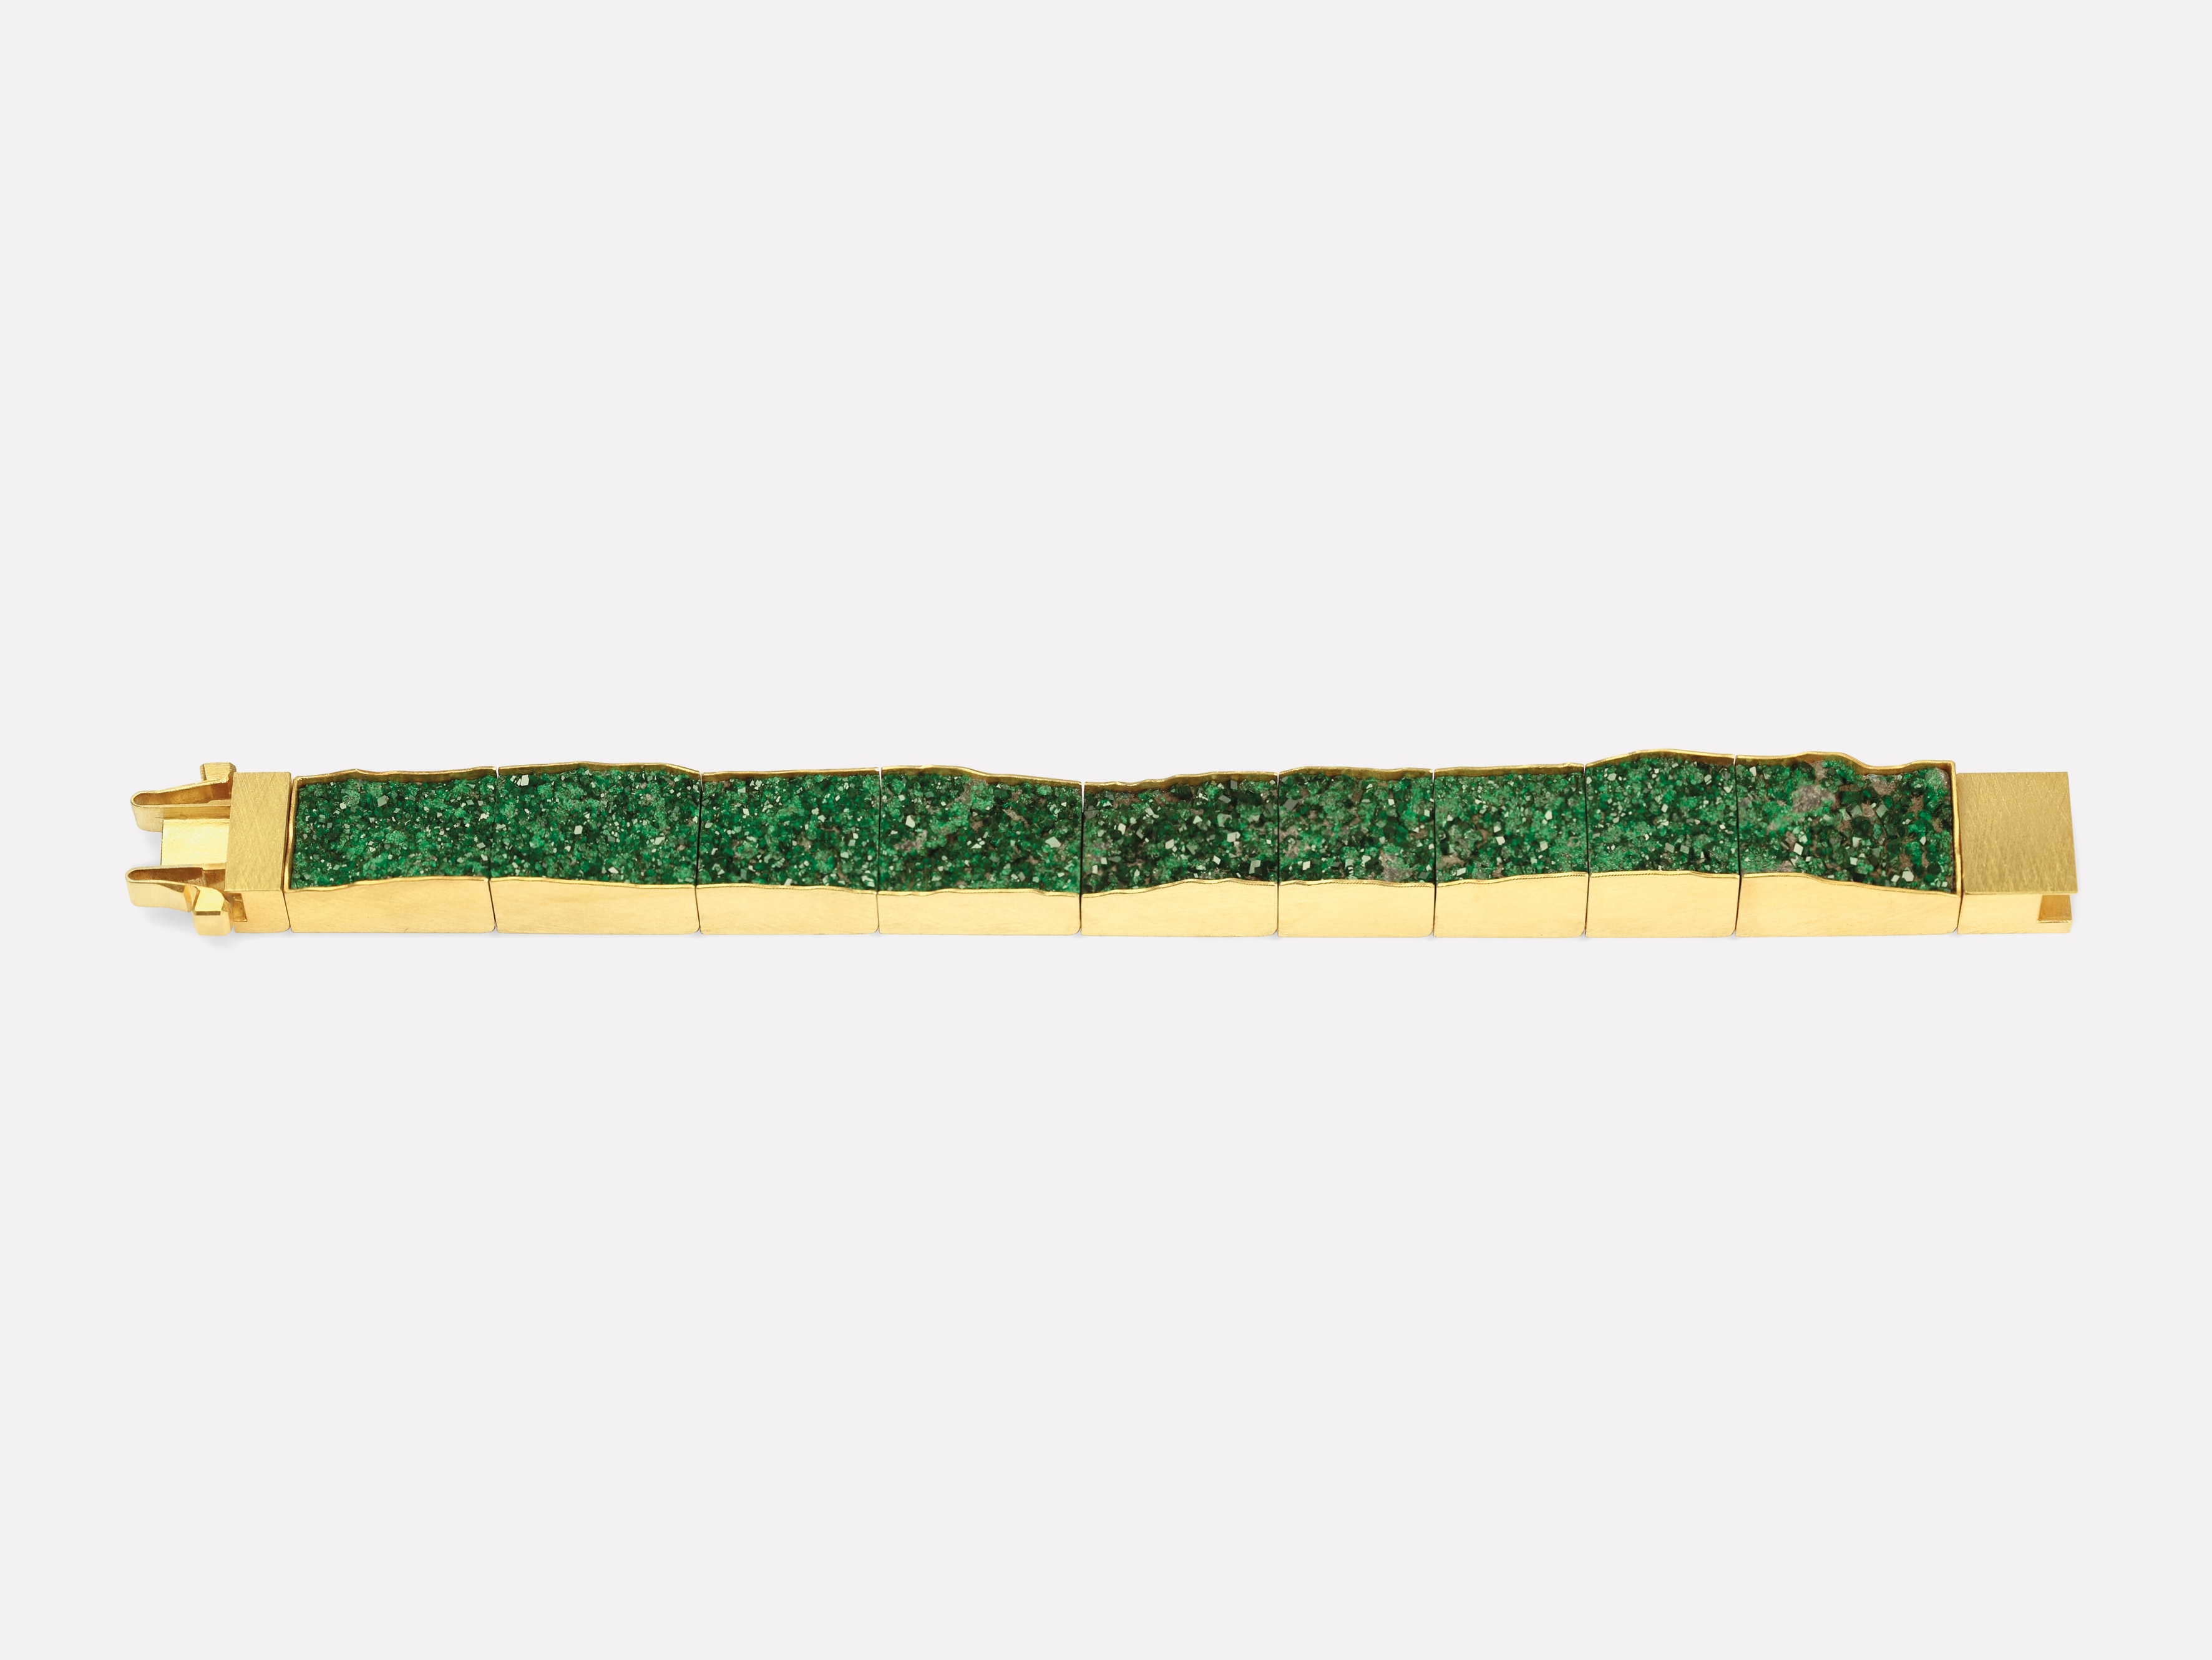 Armband_2018_Au750_Uwarowit_184mm